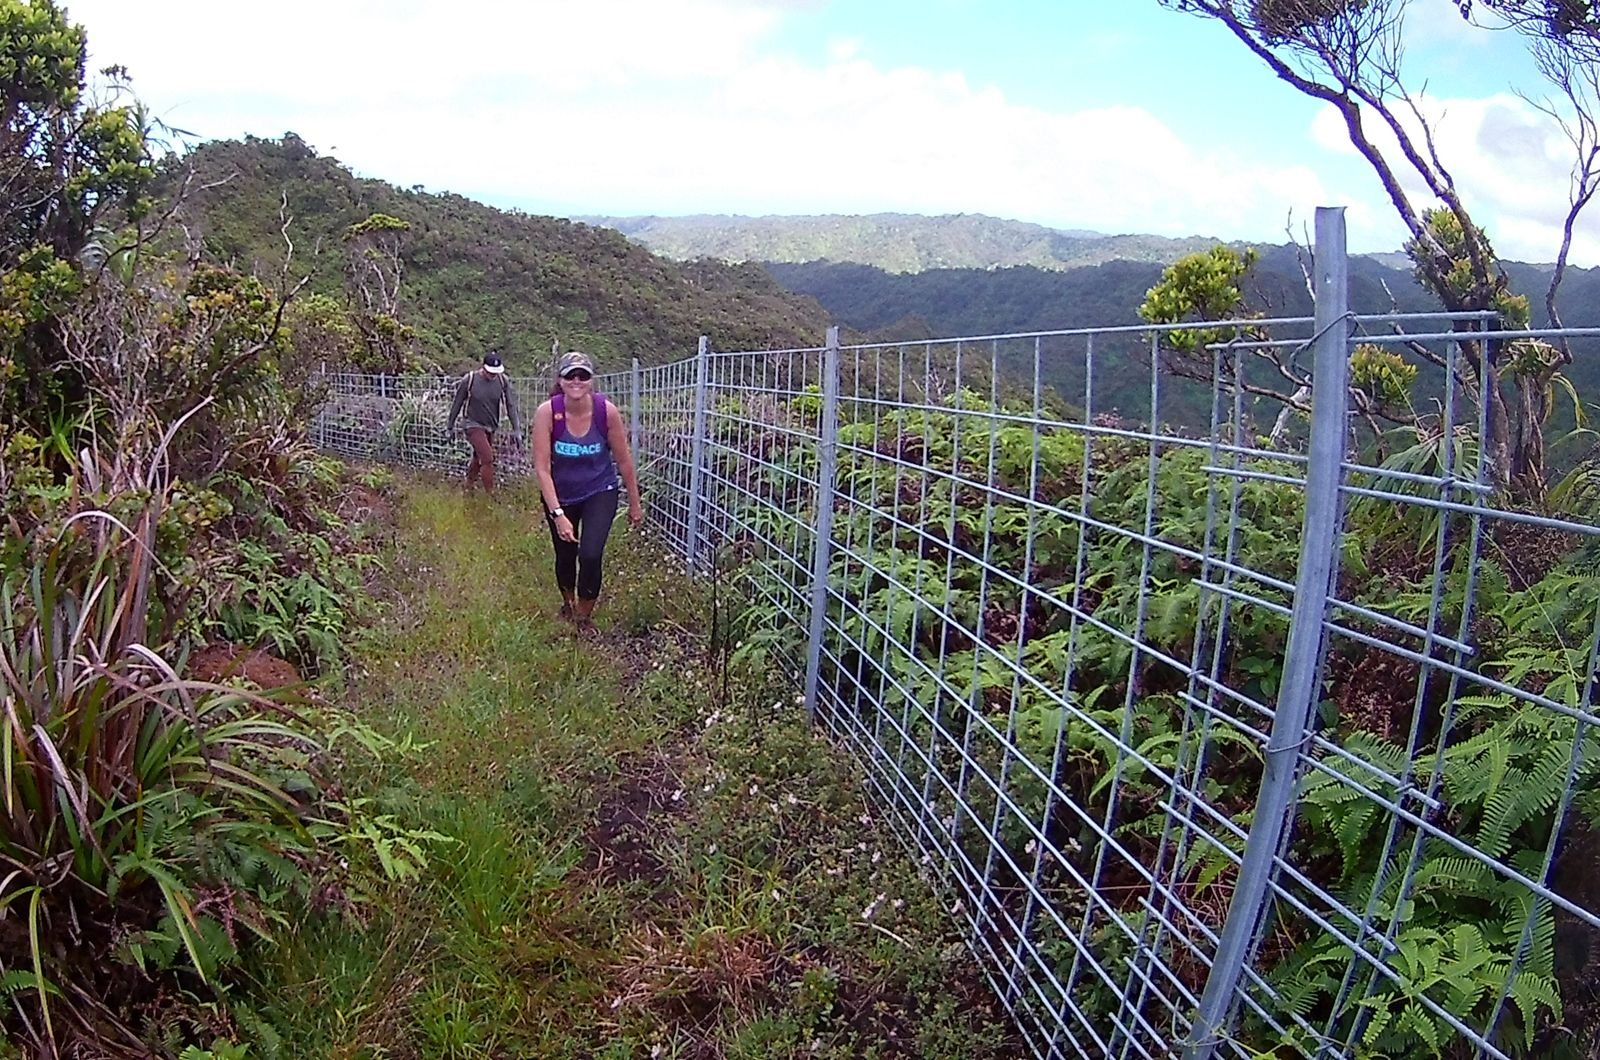 The Hawai'i Hiking Group